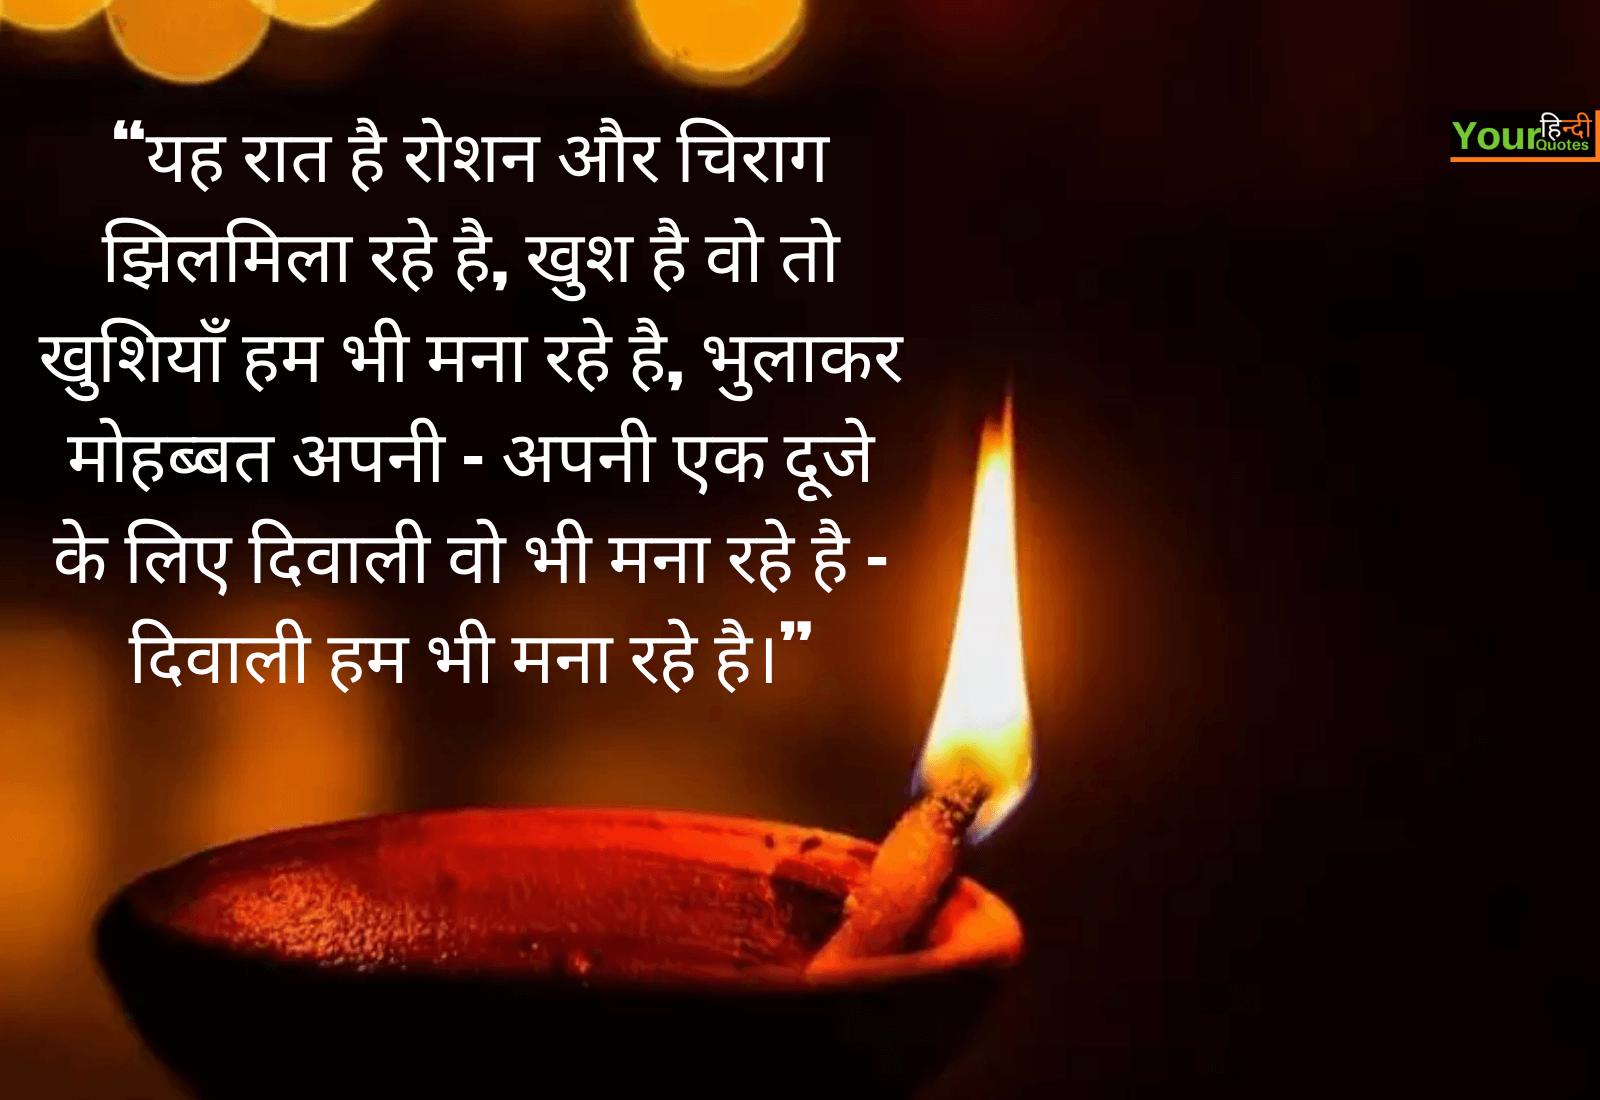 Diwali Wishes Hindi Quotes Image